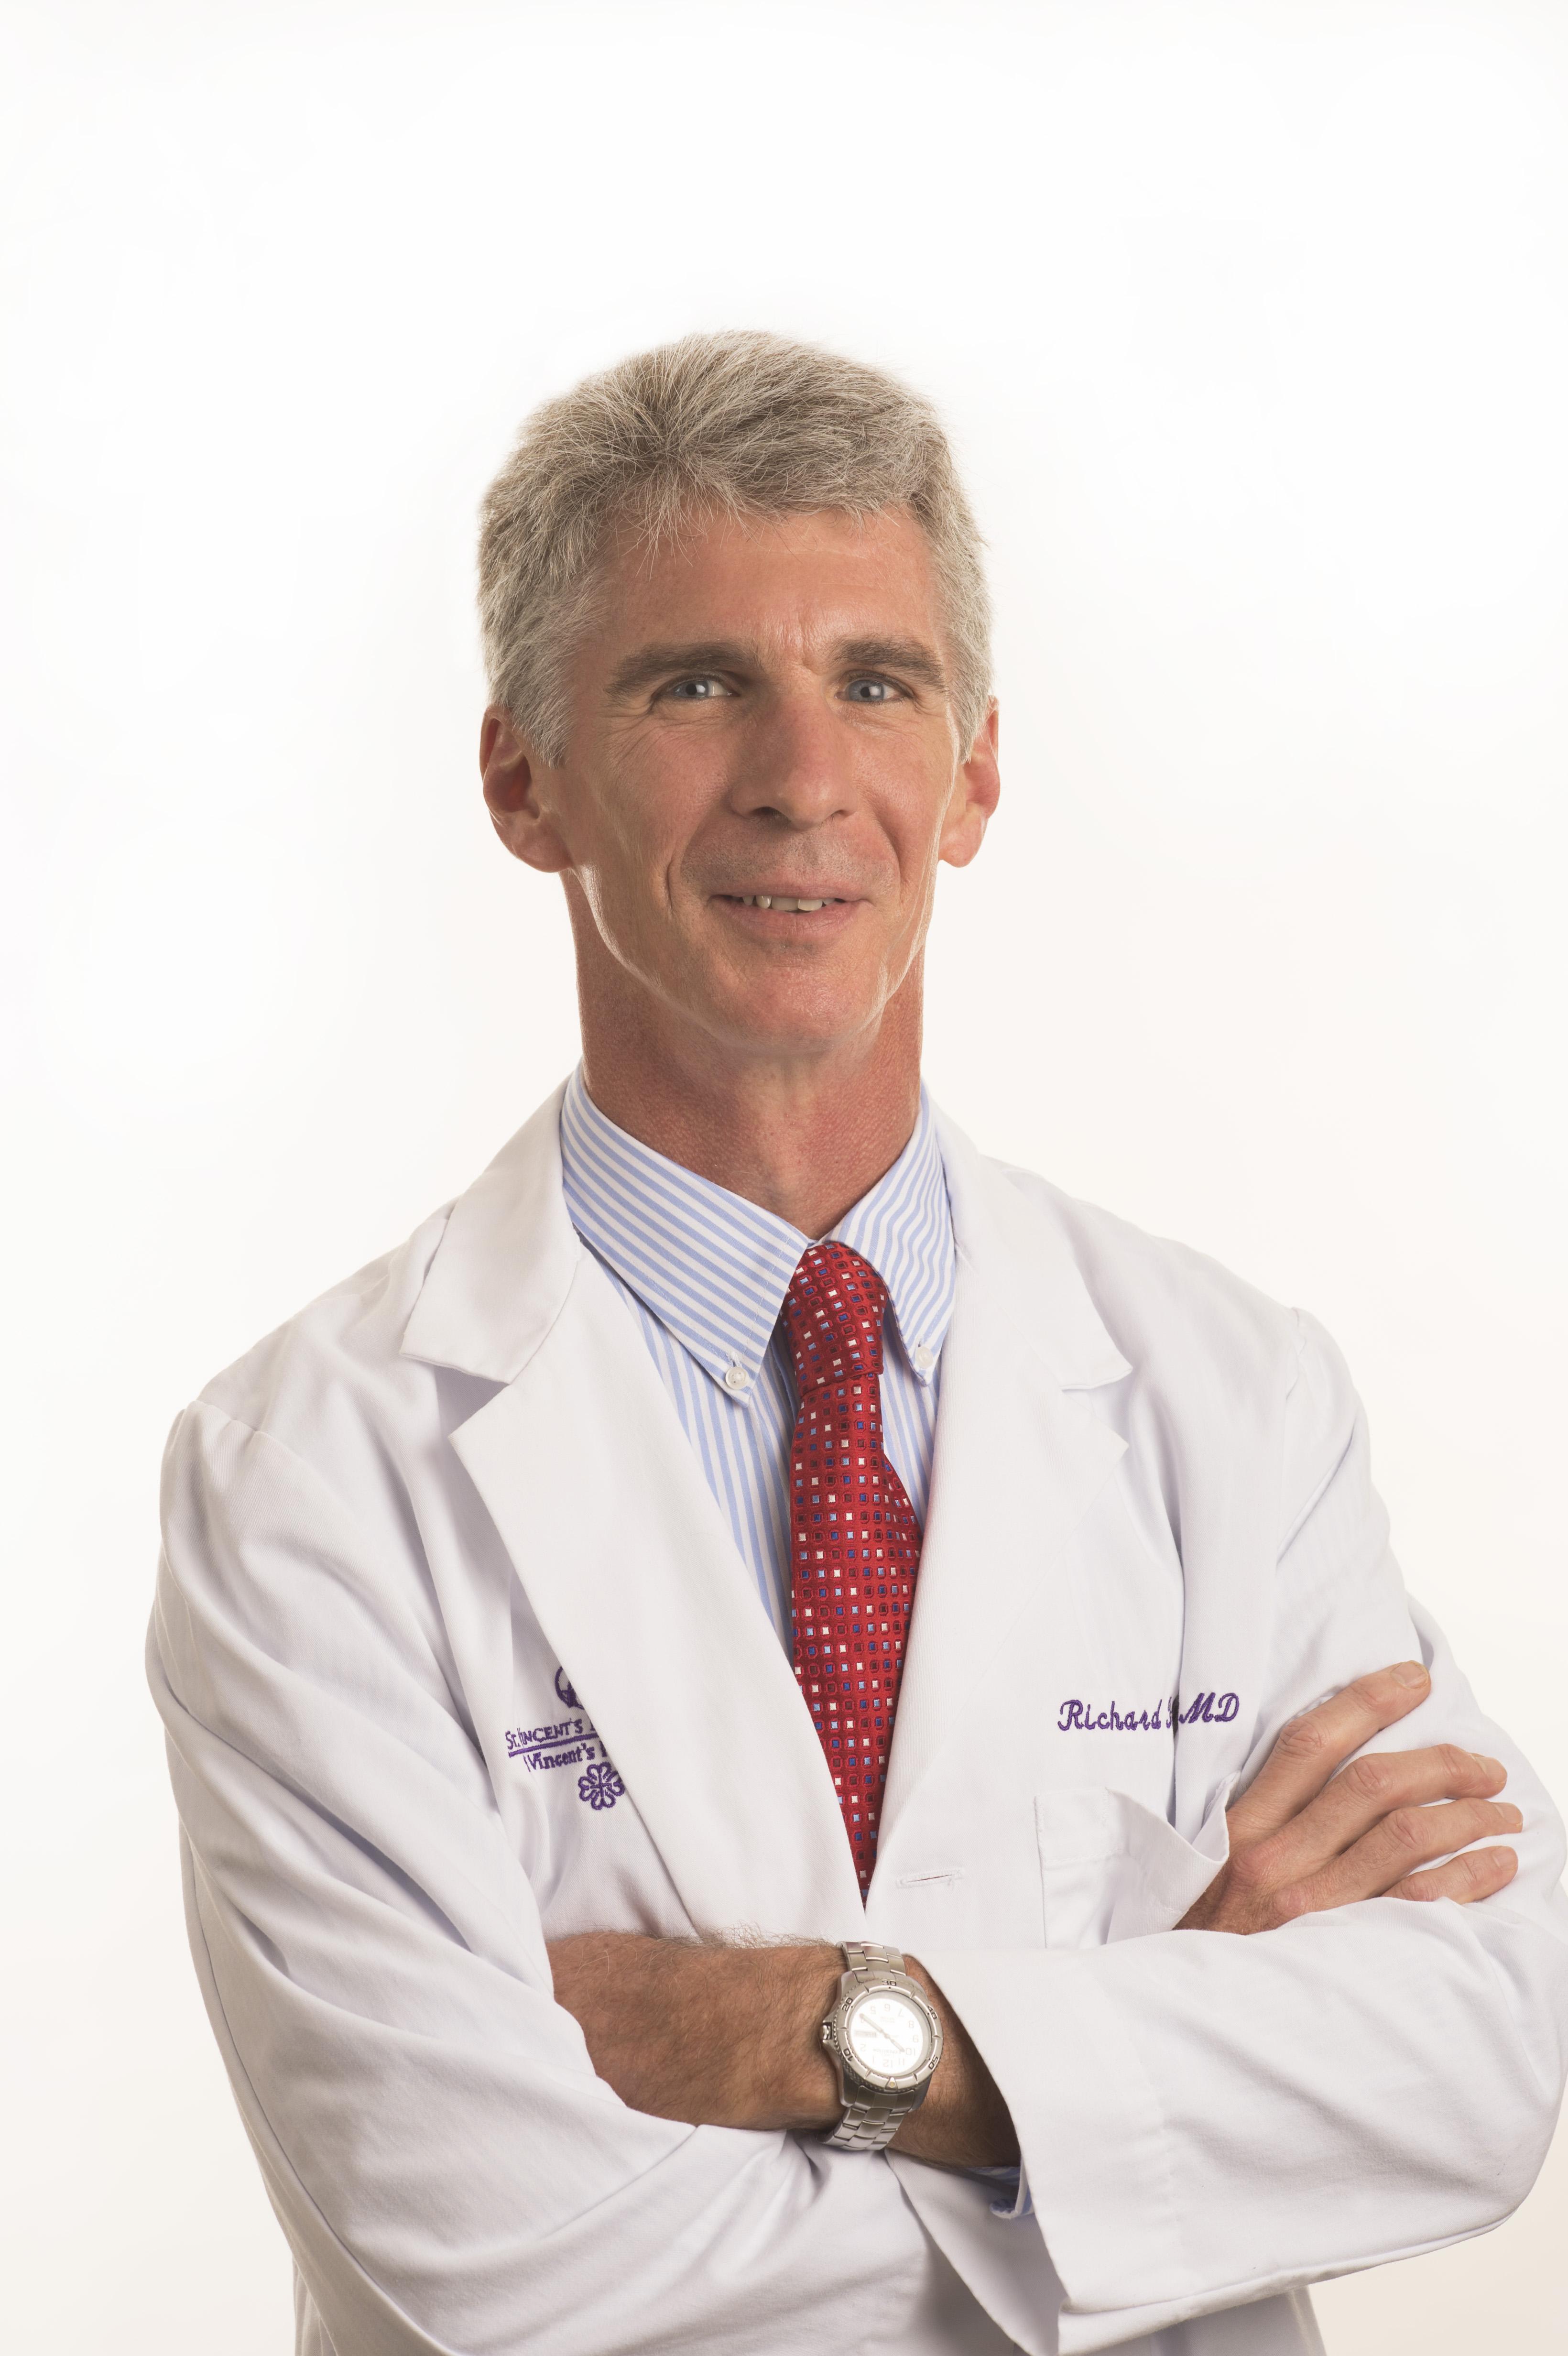 Richard Flynn, MD